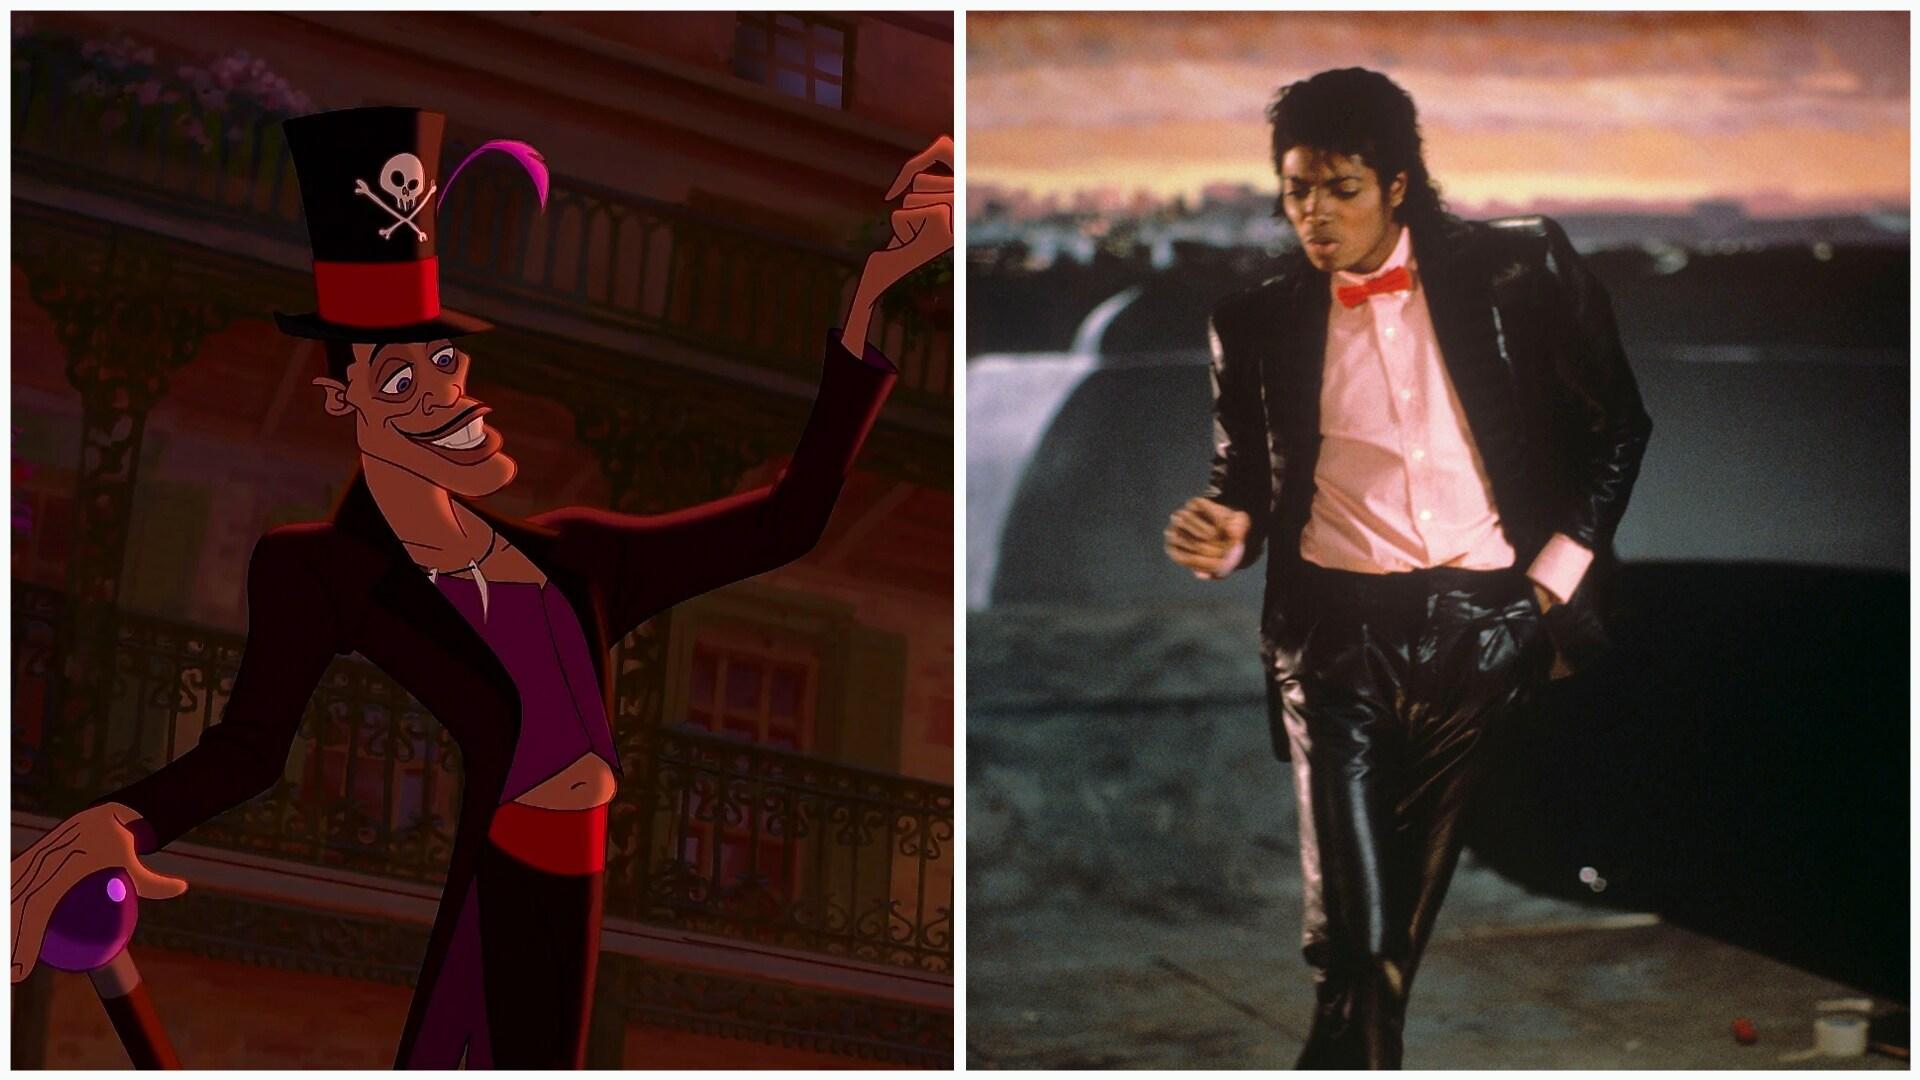 Dr. Facilier e Michael Jackson